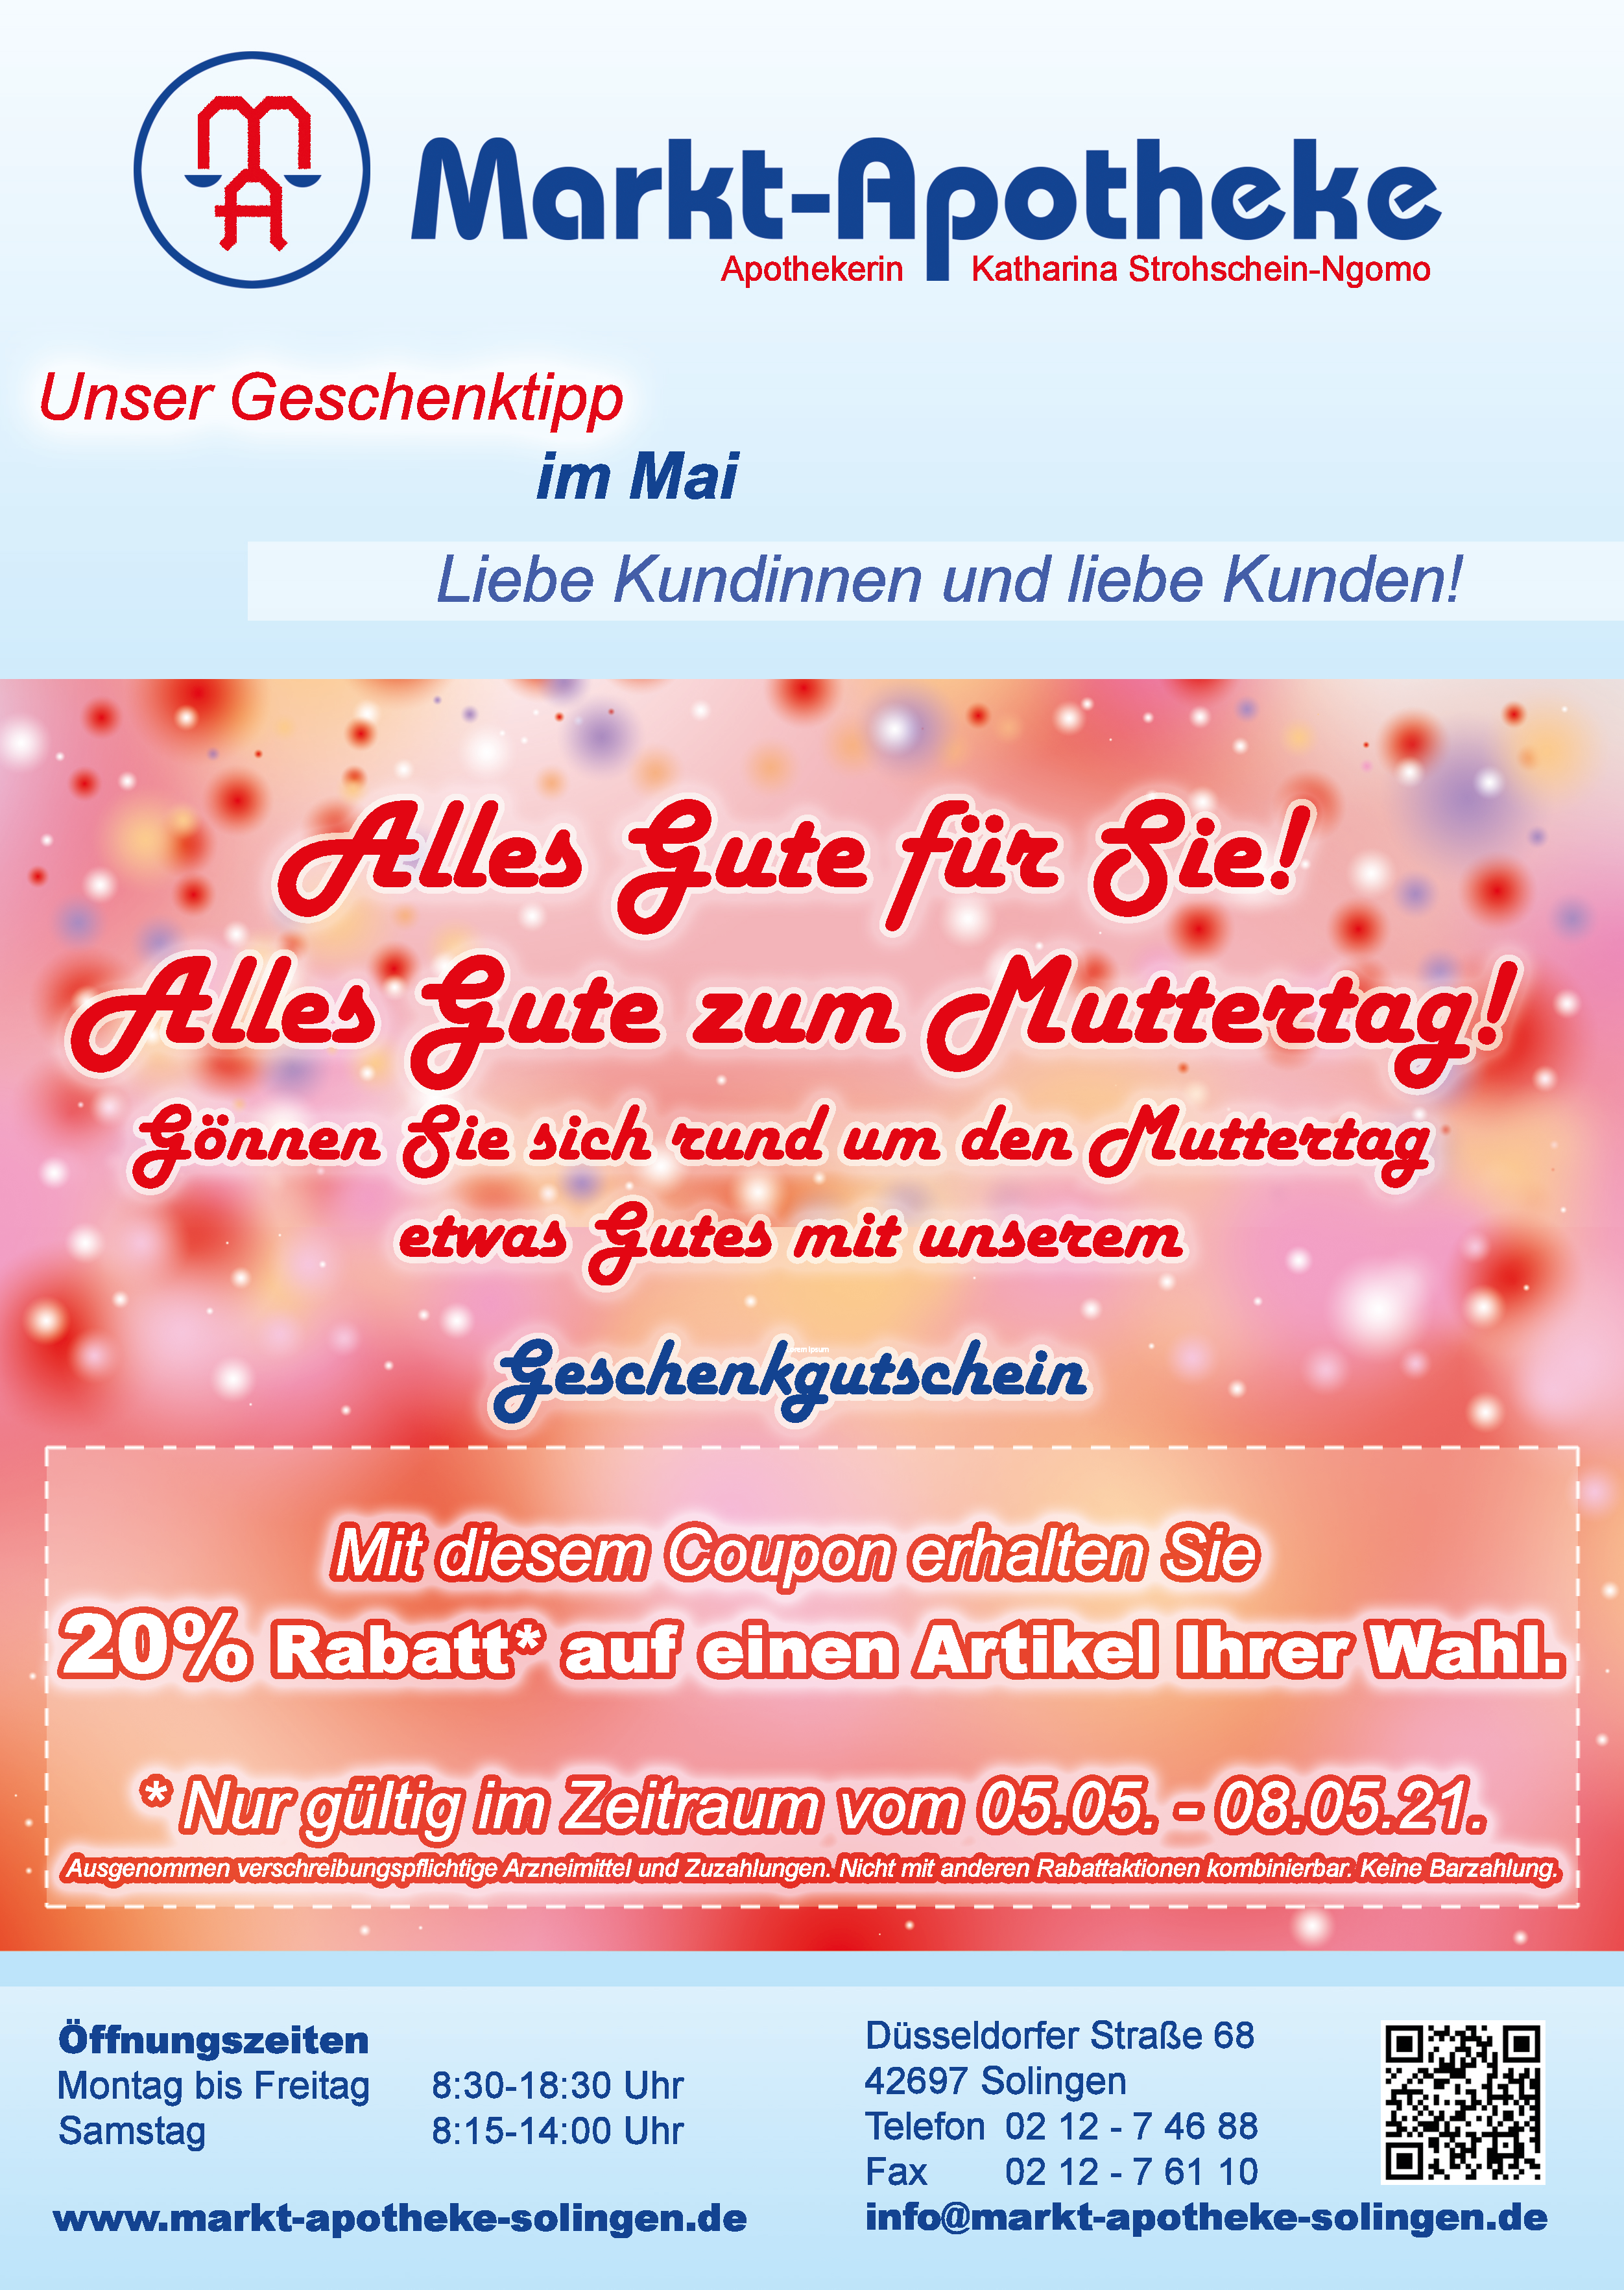 https://mein-uploads.apocdn.net/21565/leaflets/markt-apo-solingen-mai21-rueckseite%5B6289%5D-Seite1.png